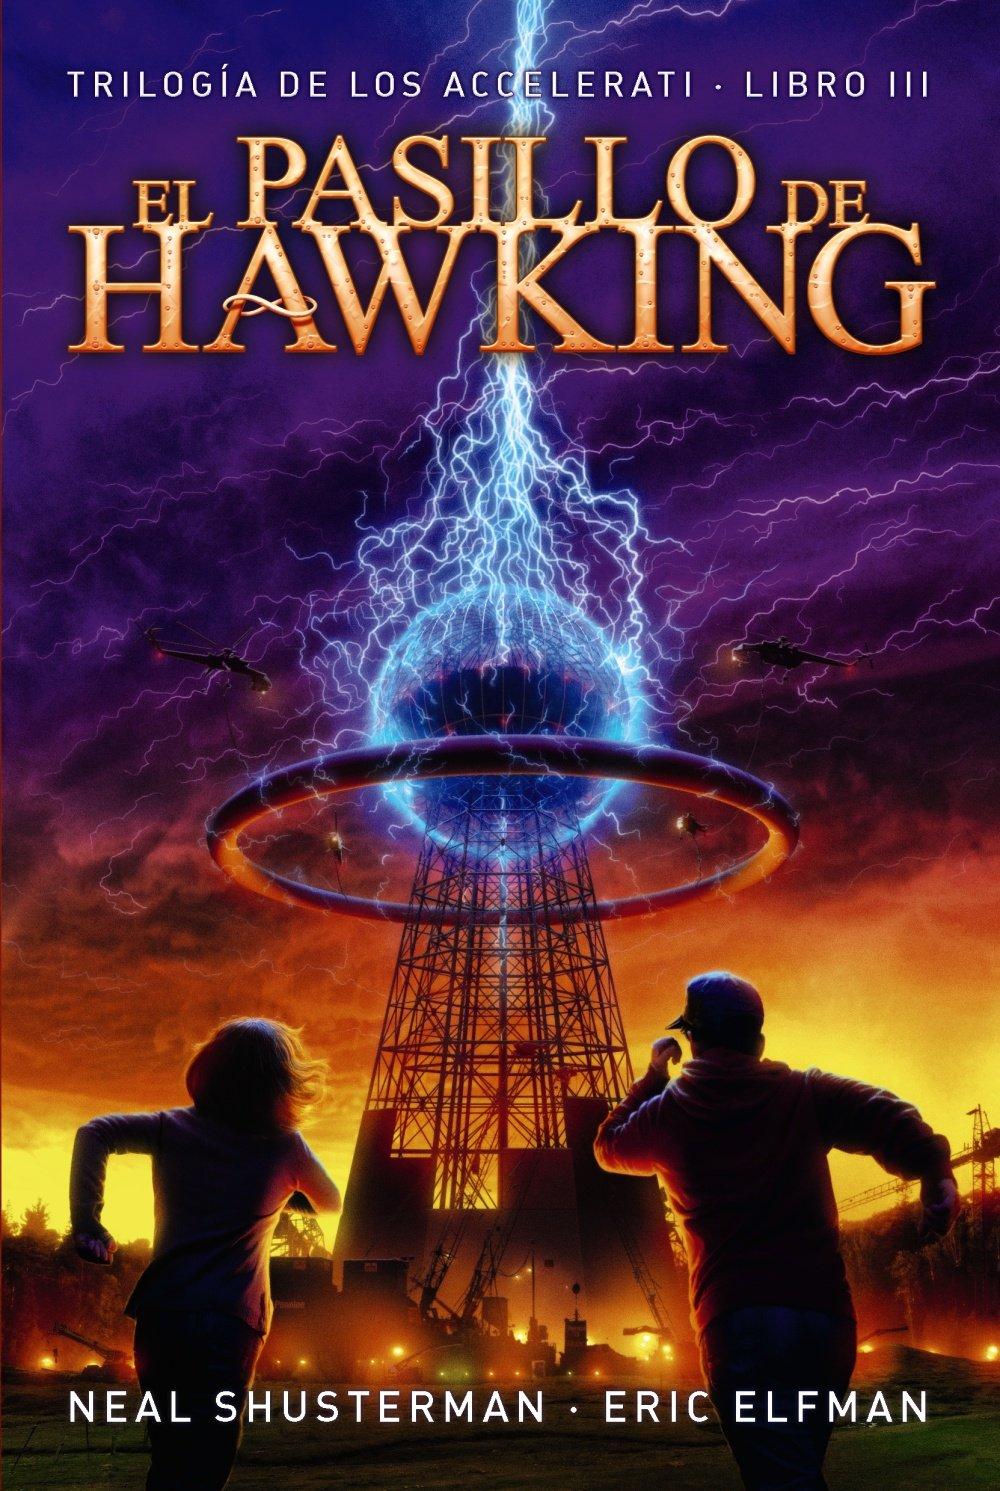 El pasillo de Hawking: Trilogía de los Accelerati, 3 Literatura Juvenil A Partir De 12 Años - Narrativa Juvenil: Amazon.es: Eric Elfman, Neal Shusterman, ...